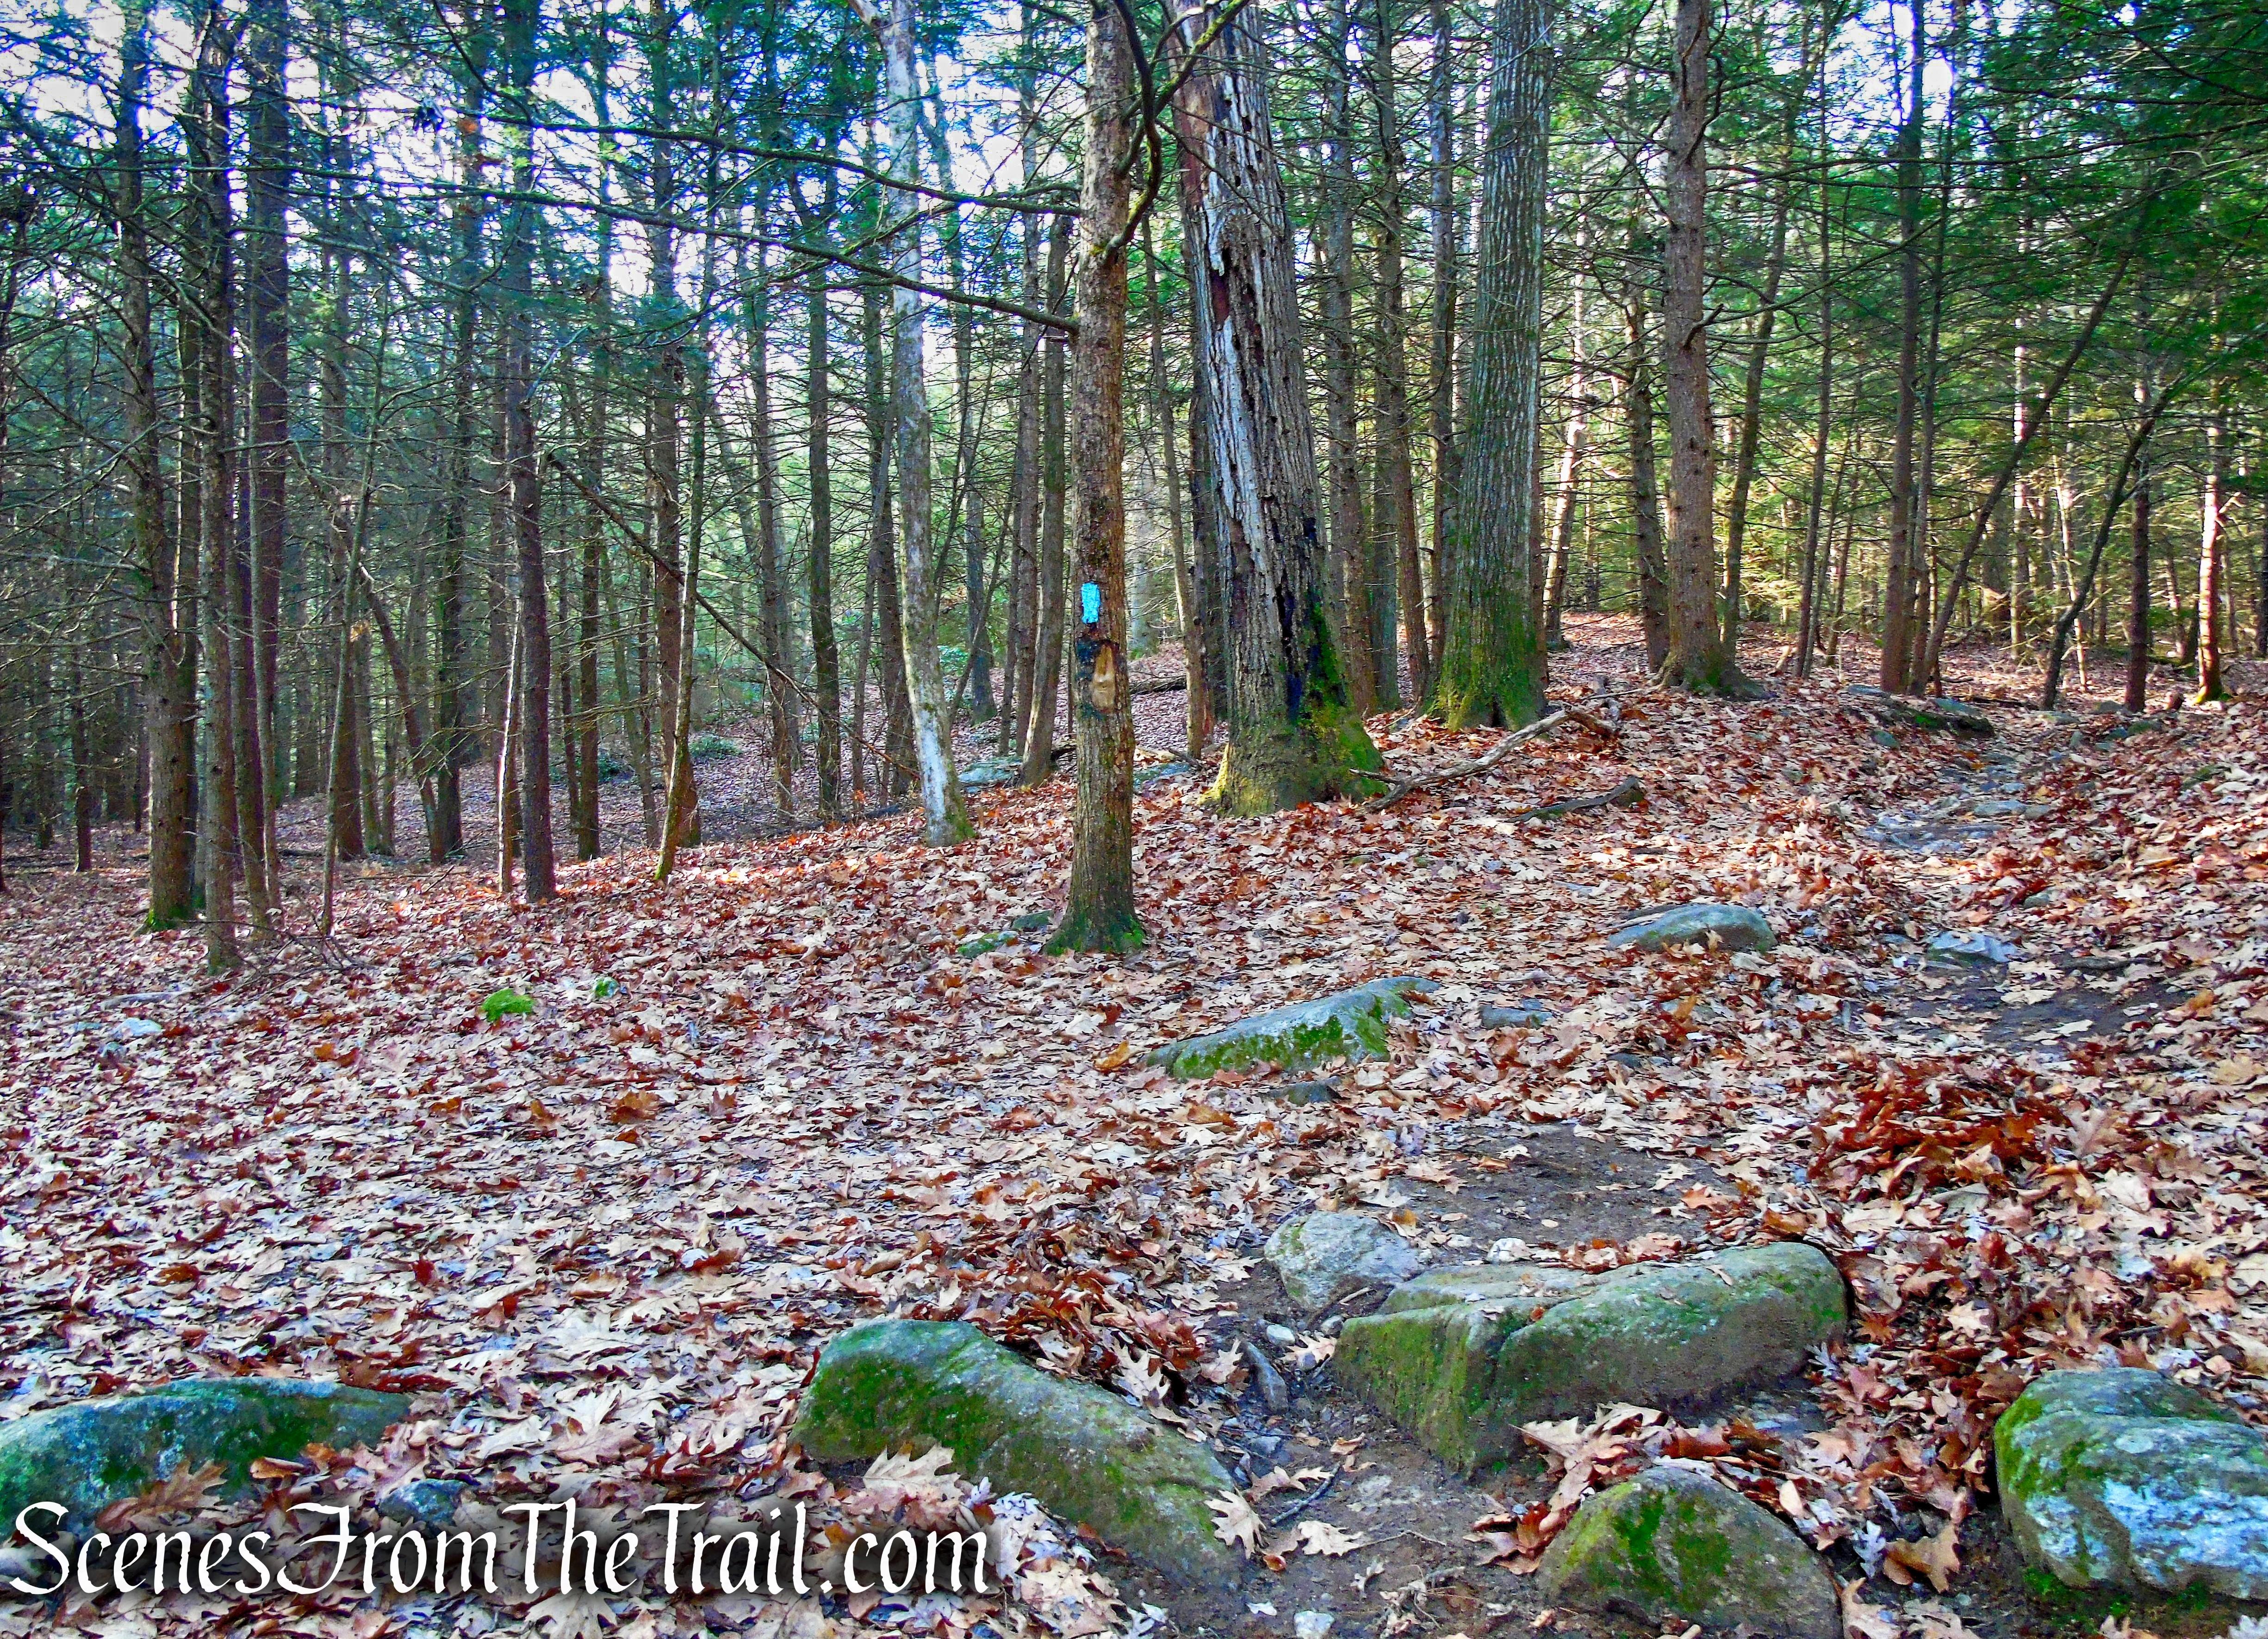 turn sharp left on Mattatuck Trail